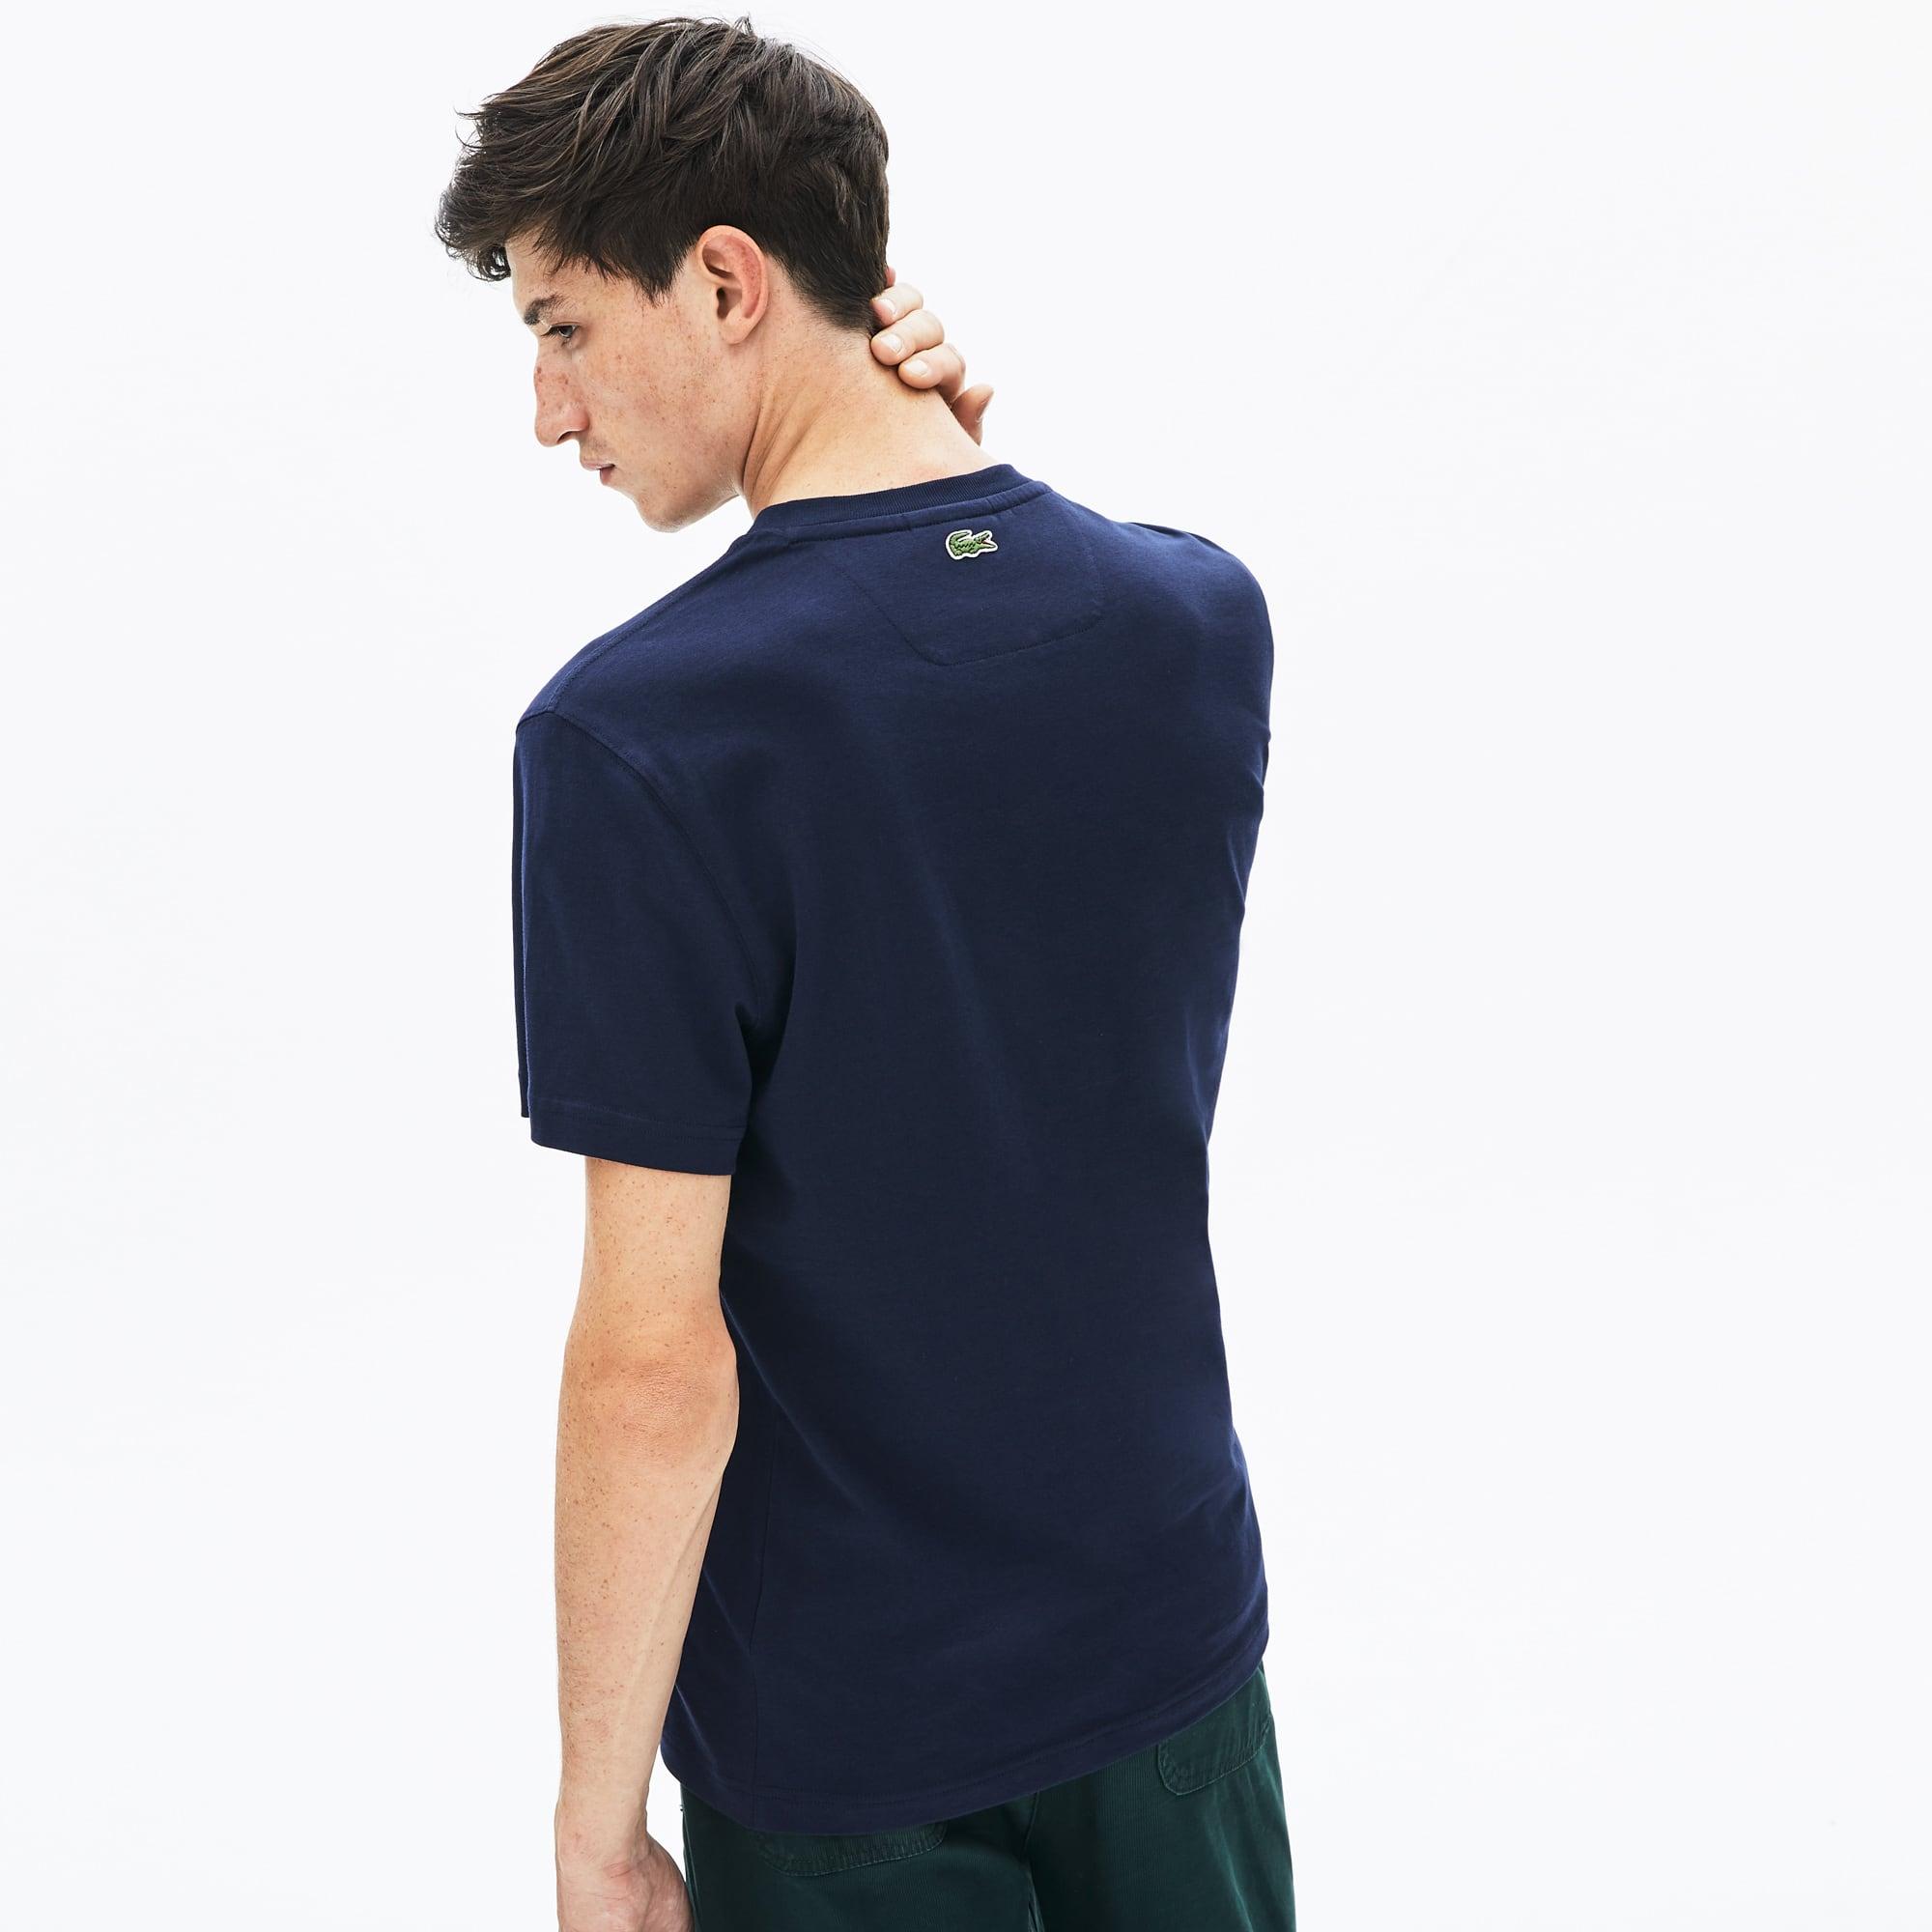 8386cb076a Men's Multicolored Logo Cotton T-shirt